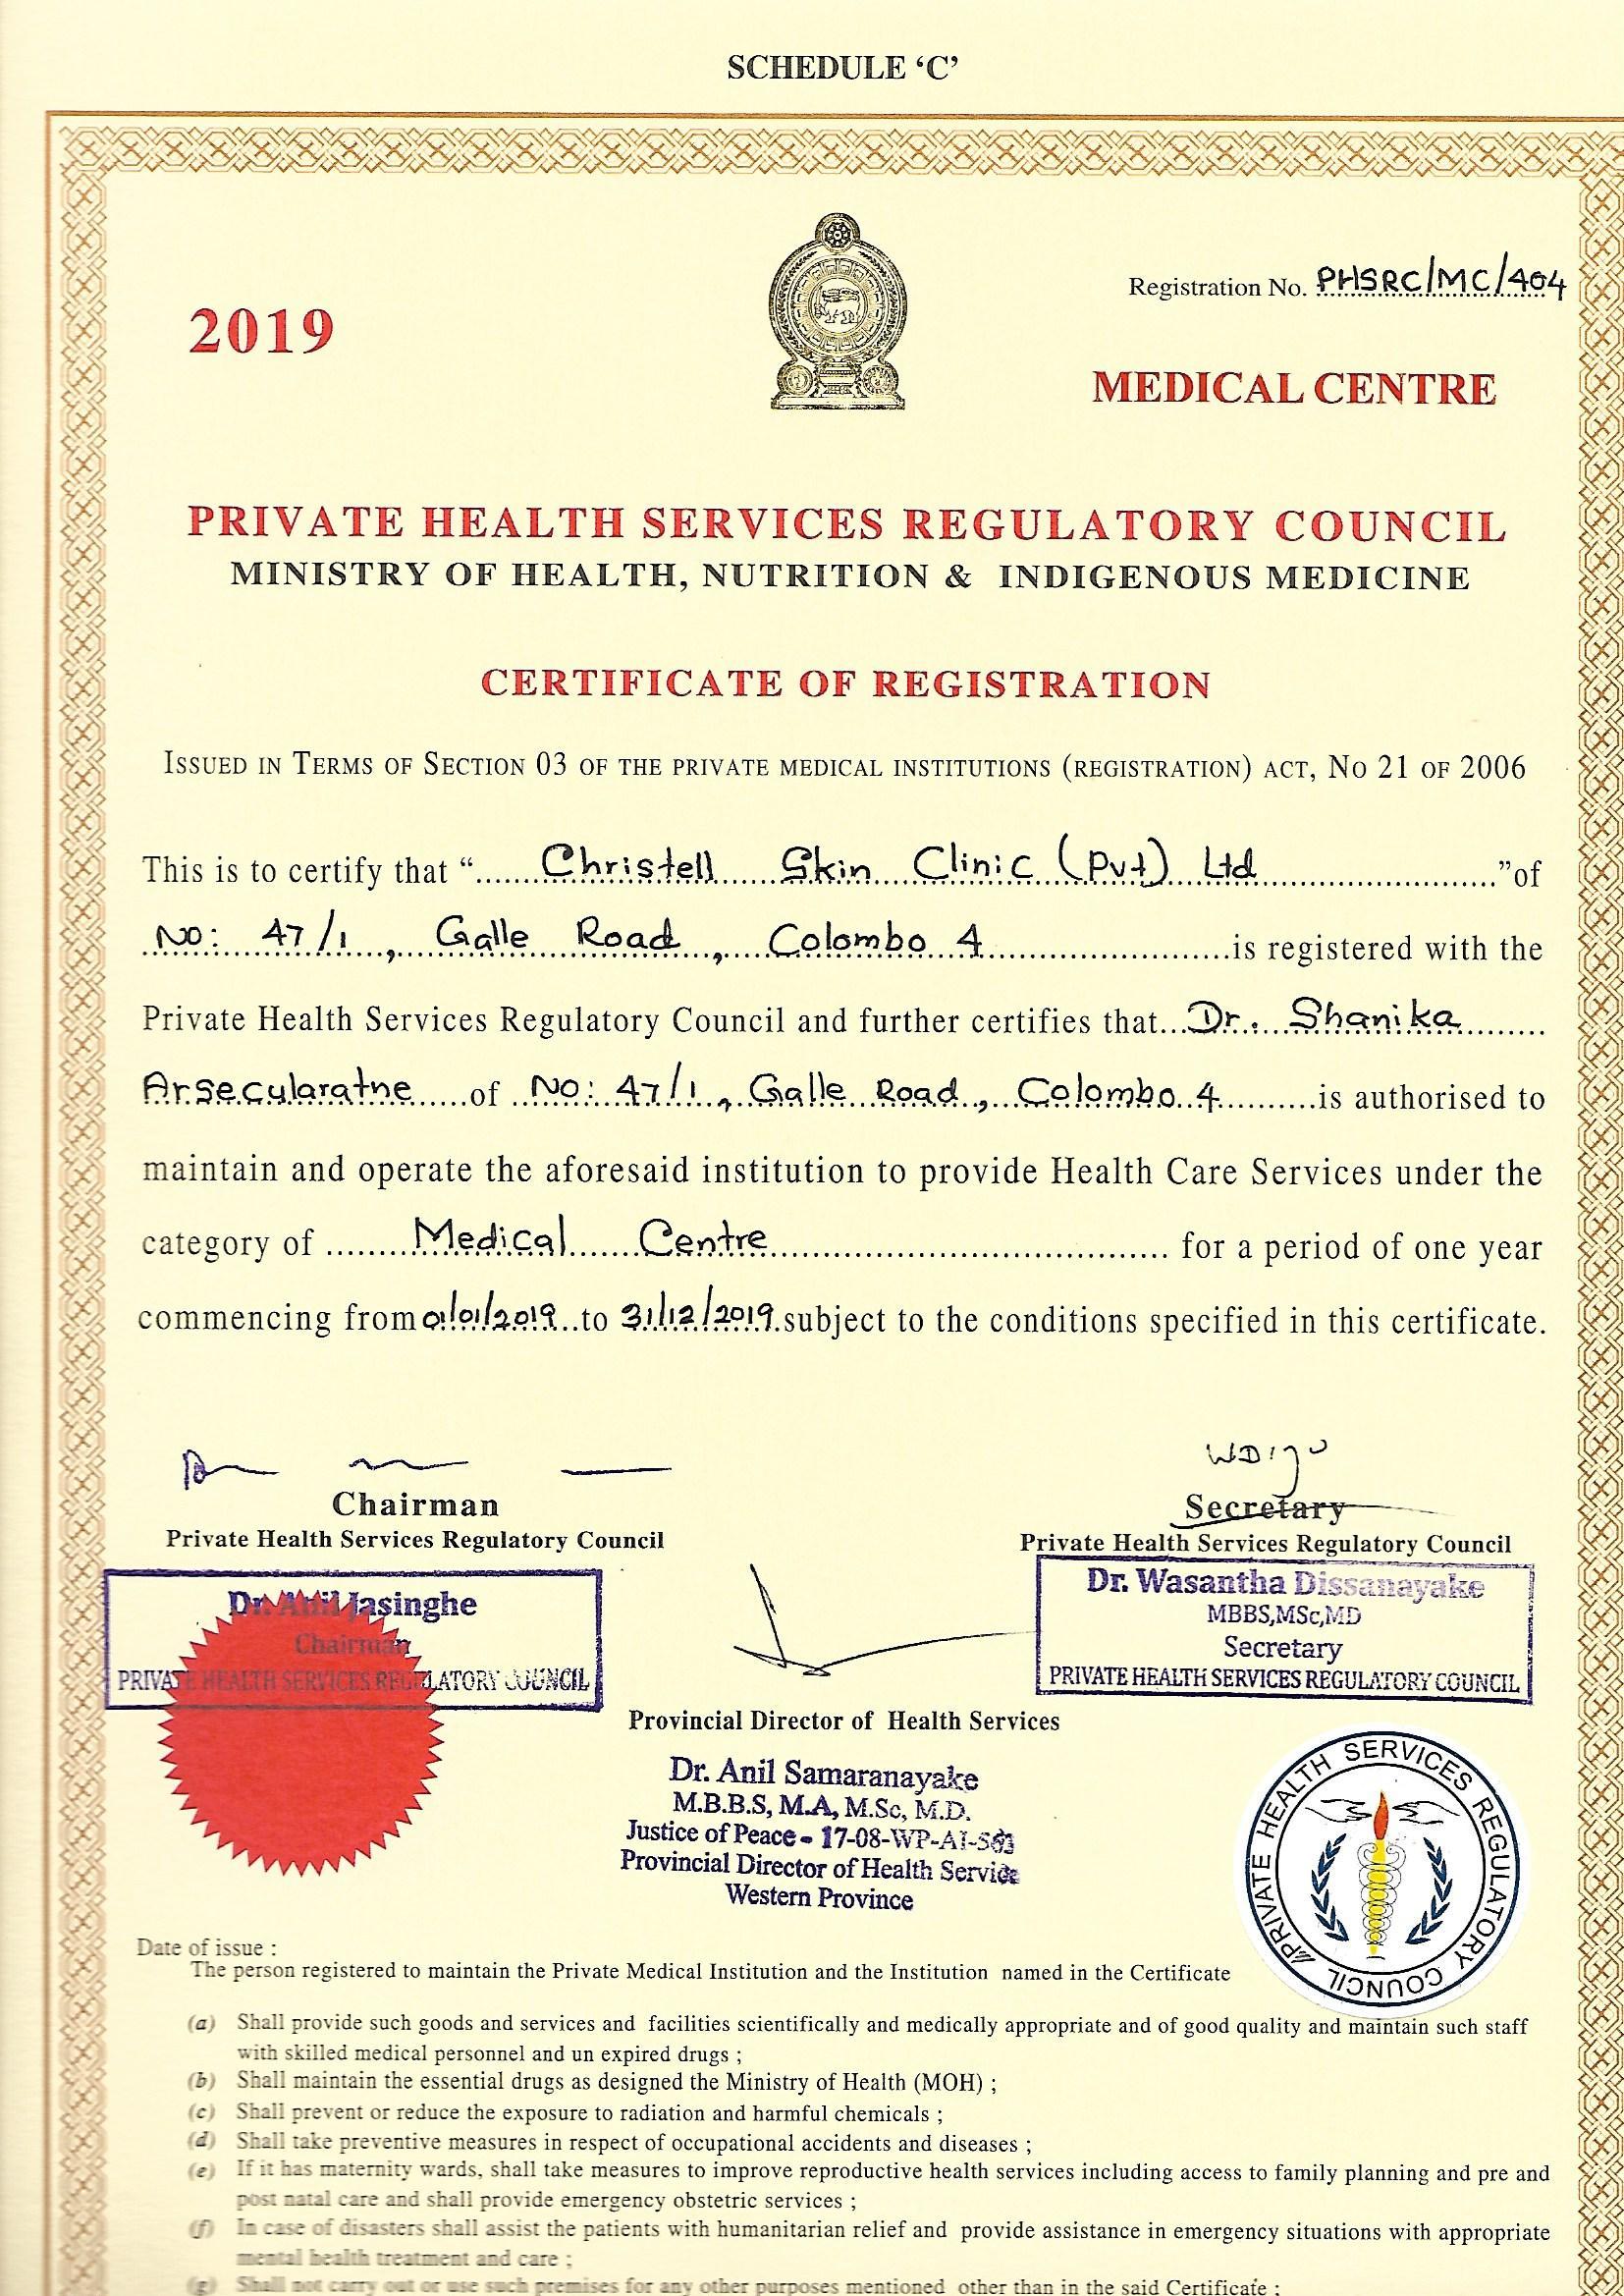 health-ministry_2019 Dr. Pavitra De Seram